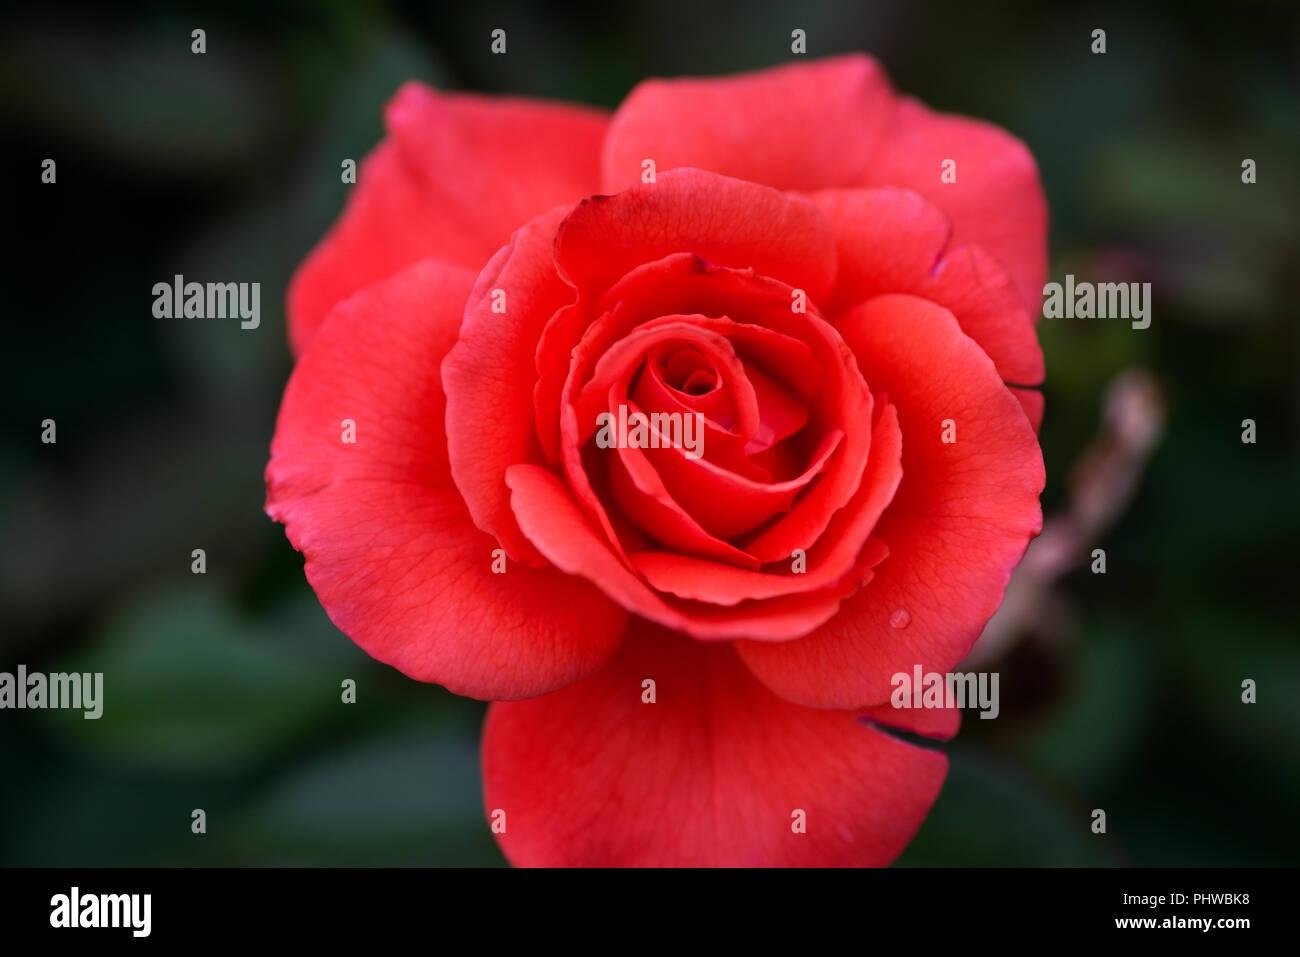 Cultivar Bouquet Rose Stock Photos Cultivar Bouquet Rose Stock